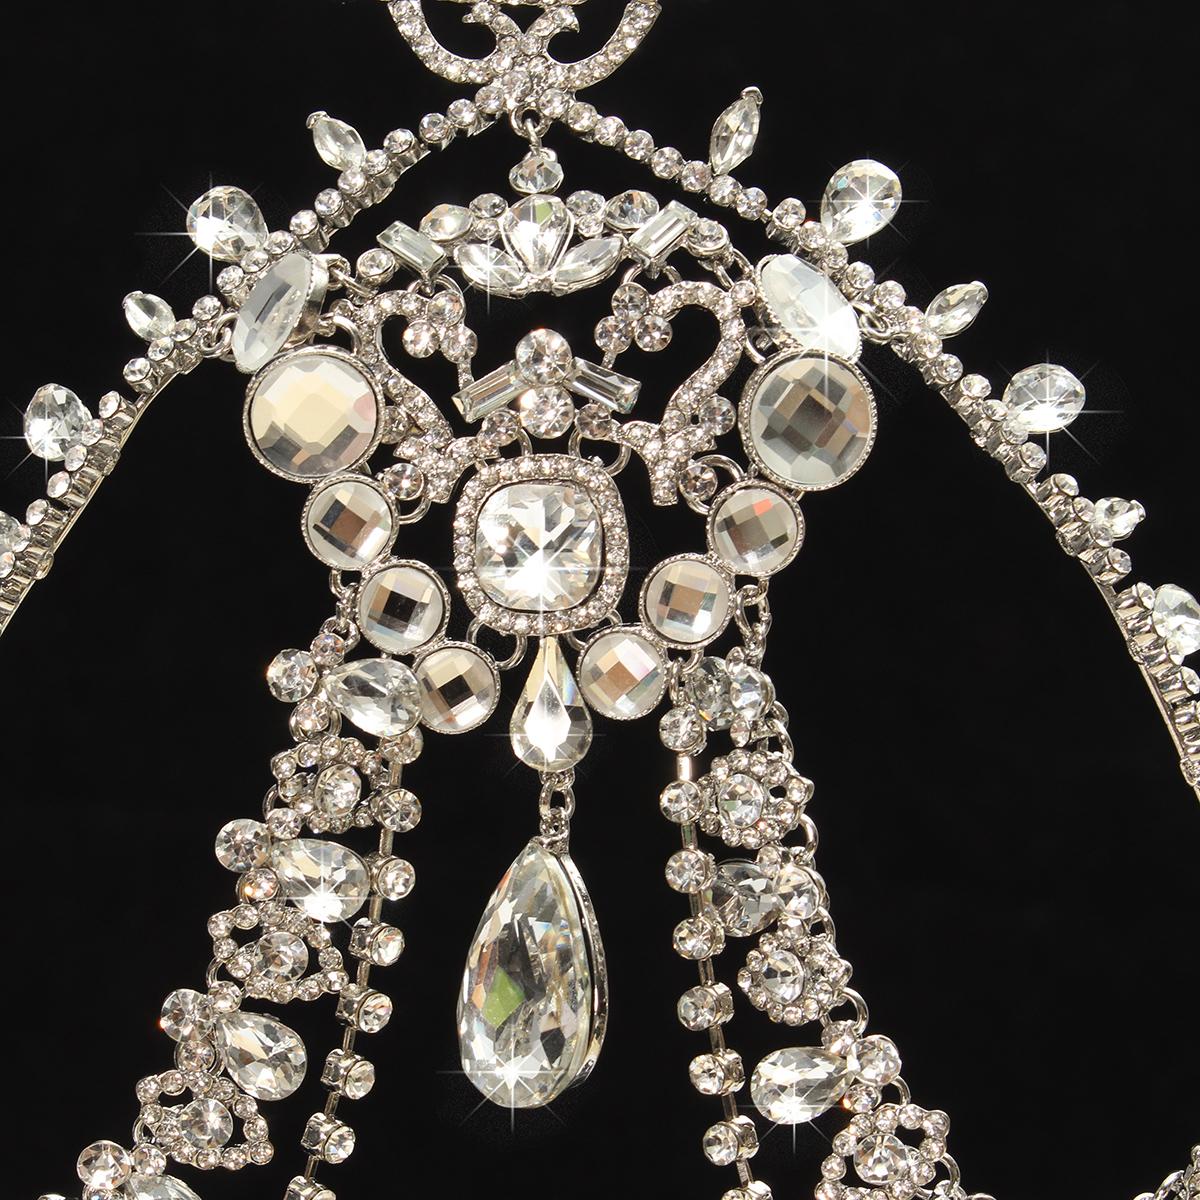 Bride Diamond Sparkling Crystal Rhinestone Hair Chain King Queen Tiara Wedding Party Headpiece